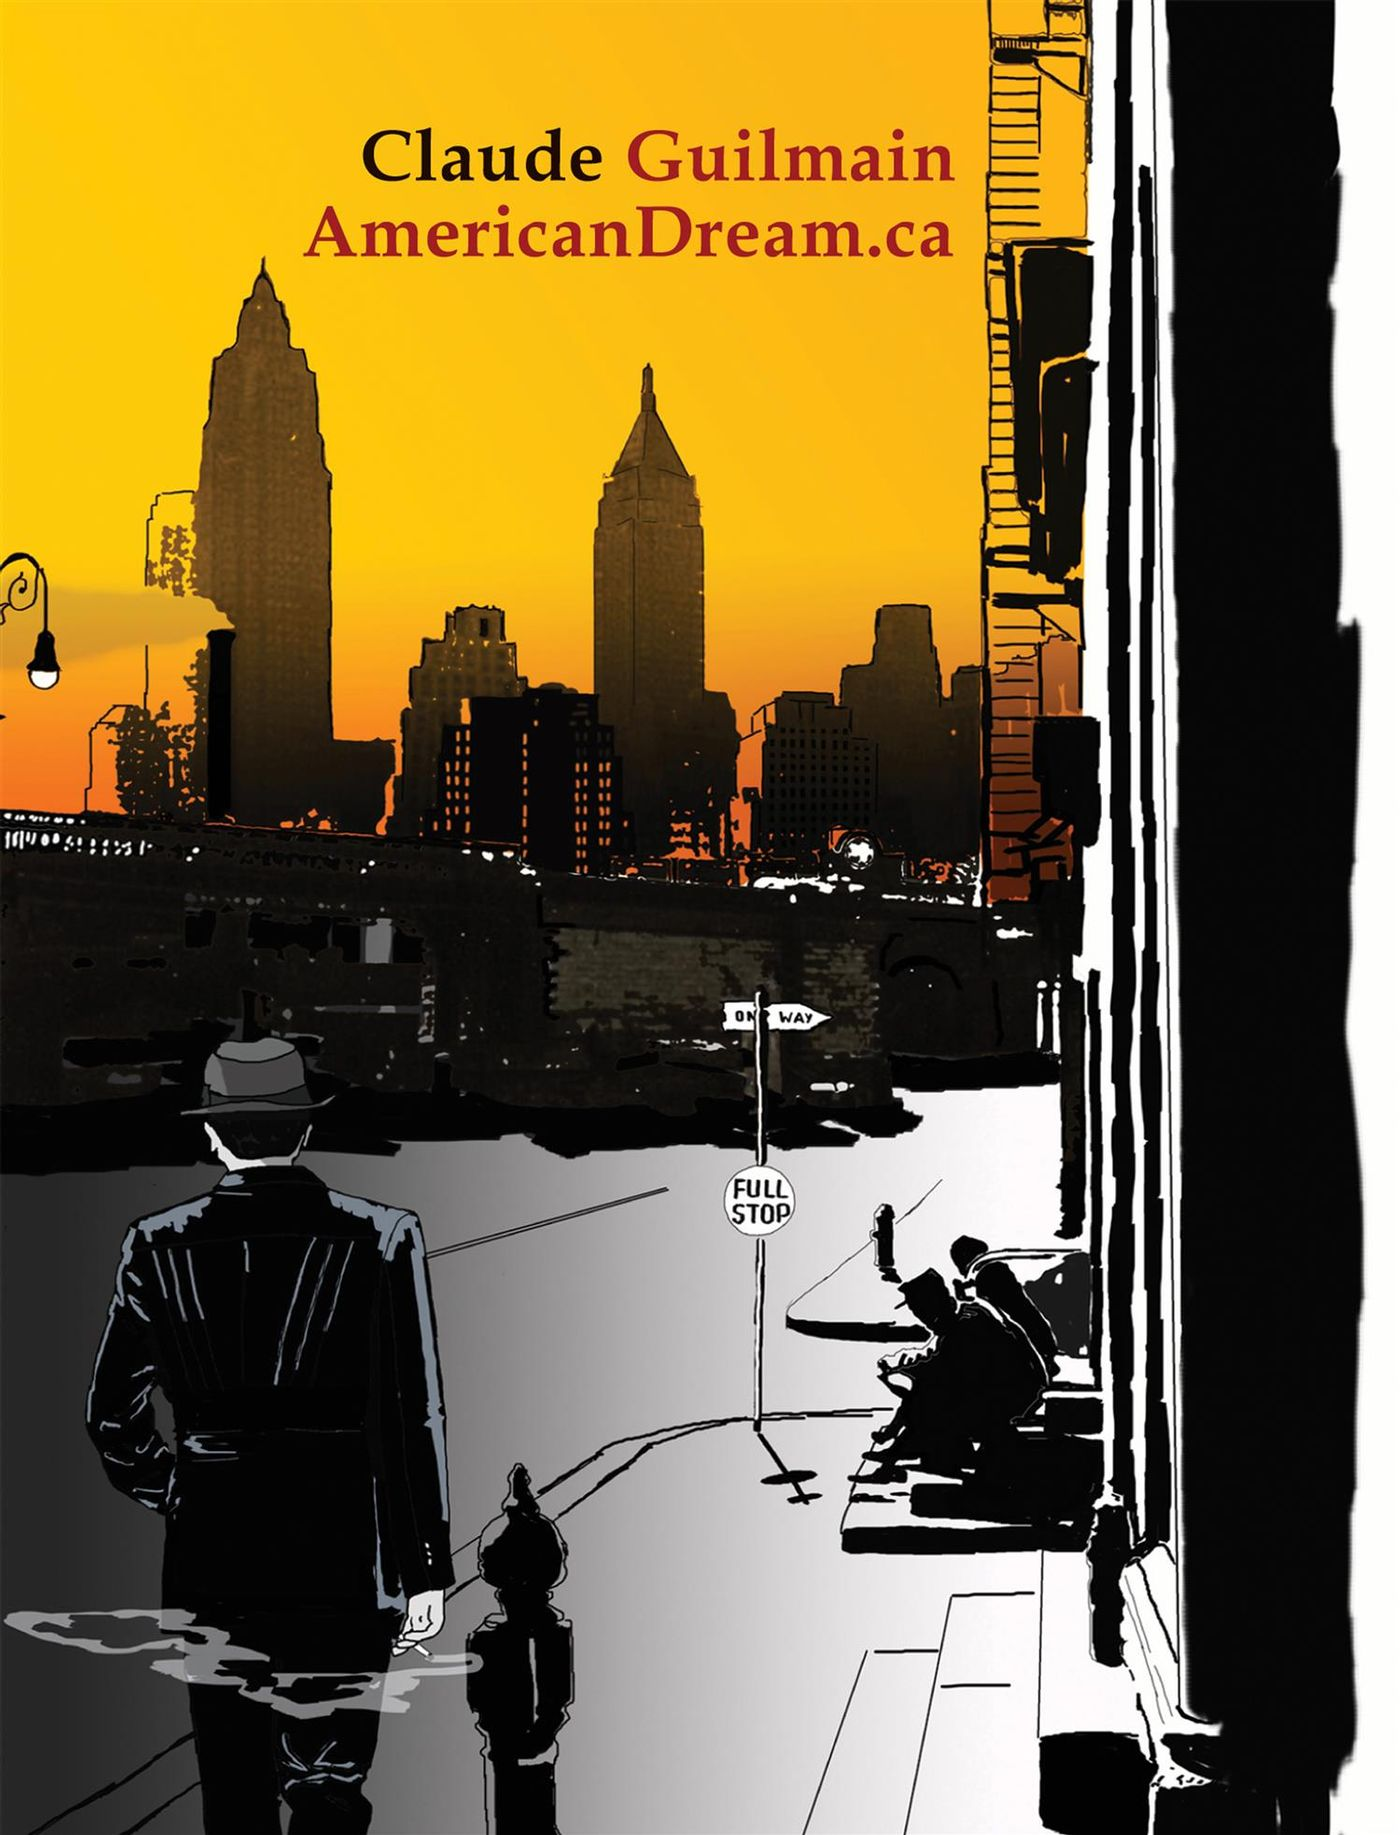 AmericanDream.ca